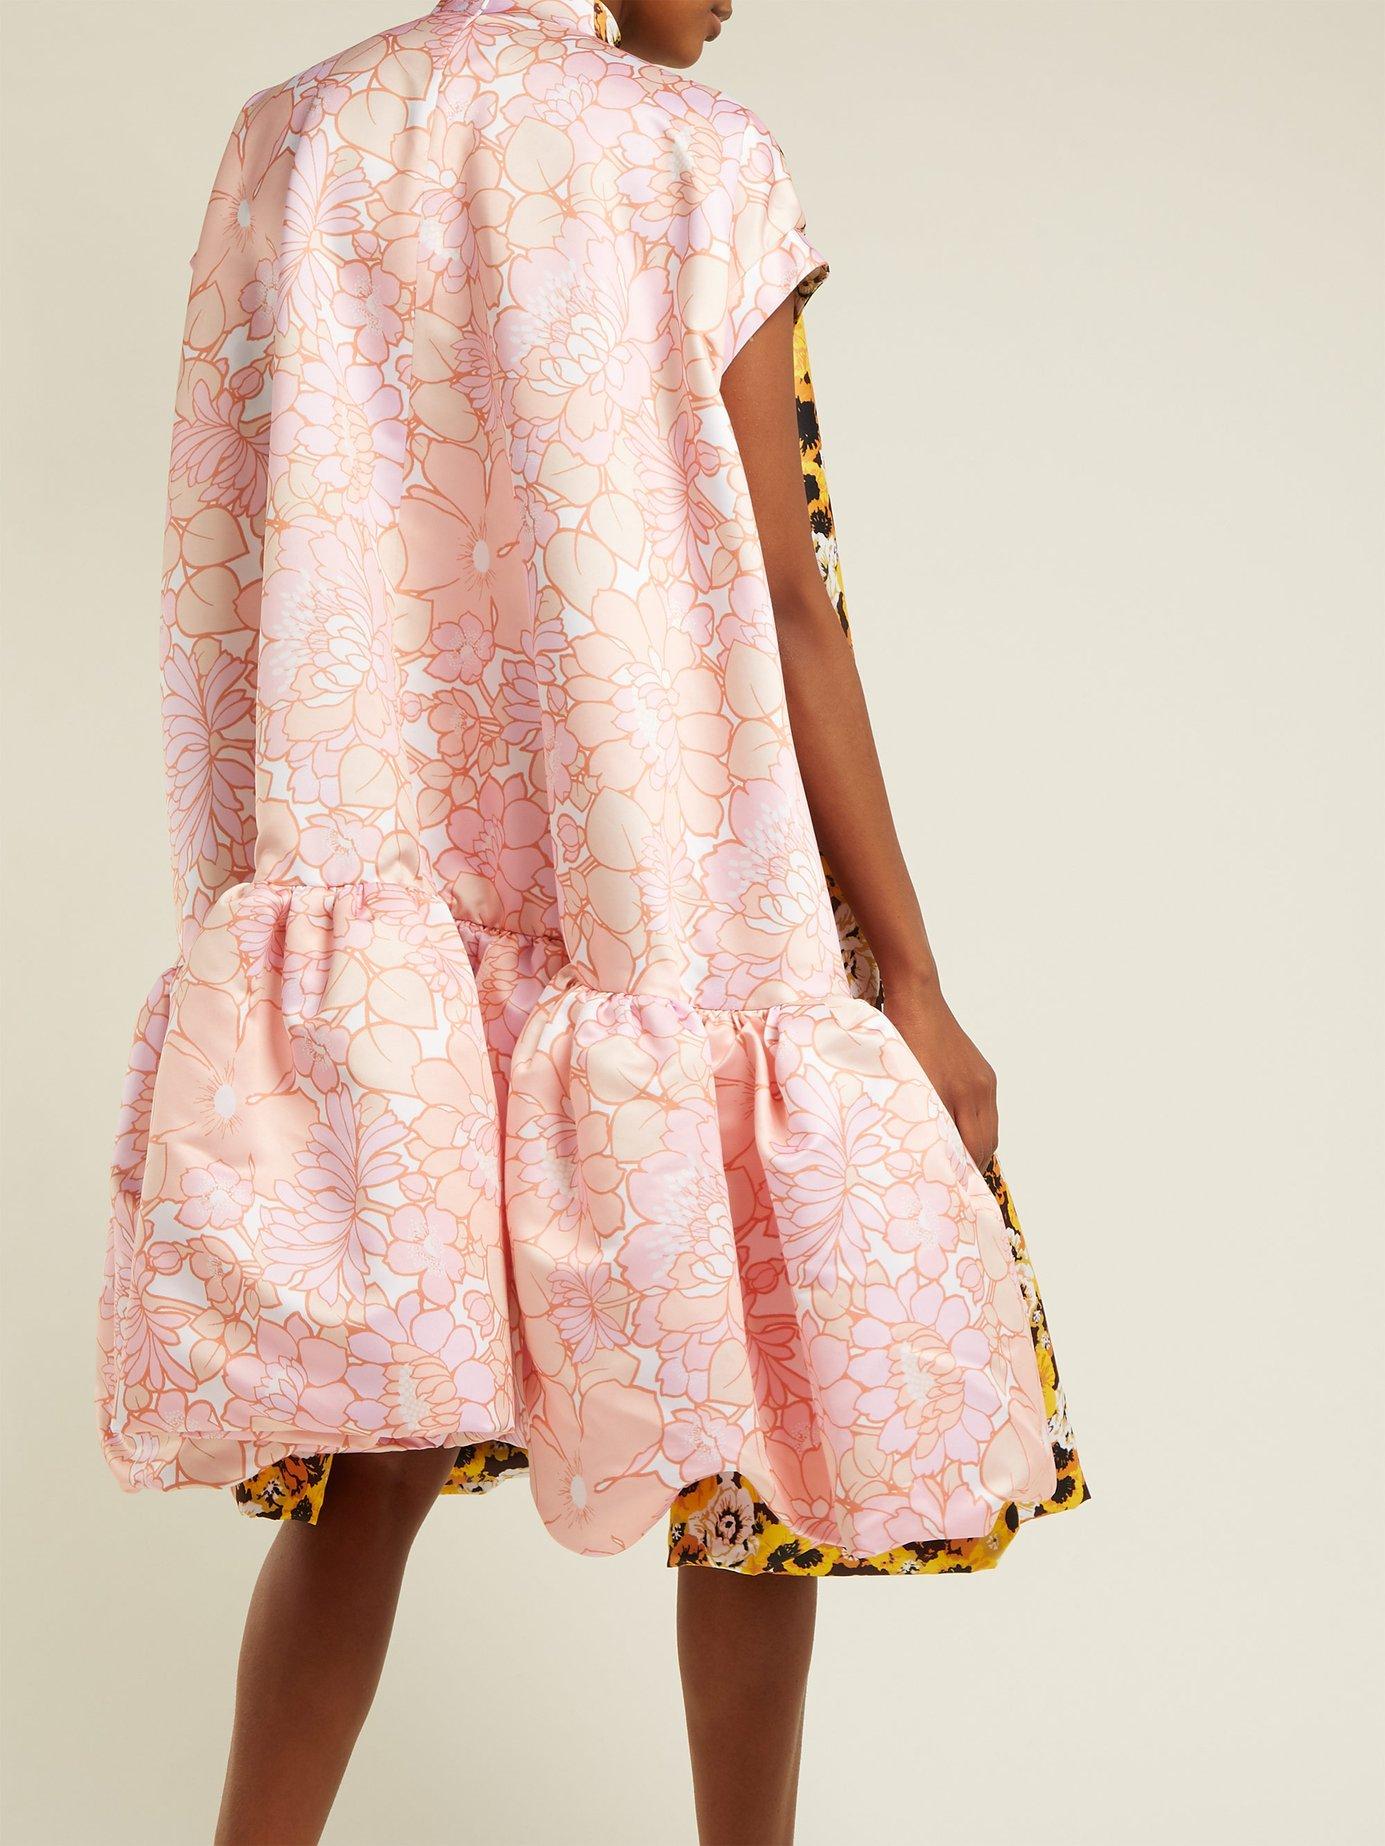 Floral-print A-line duchess satin dress by Richard Quinn